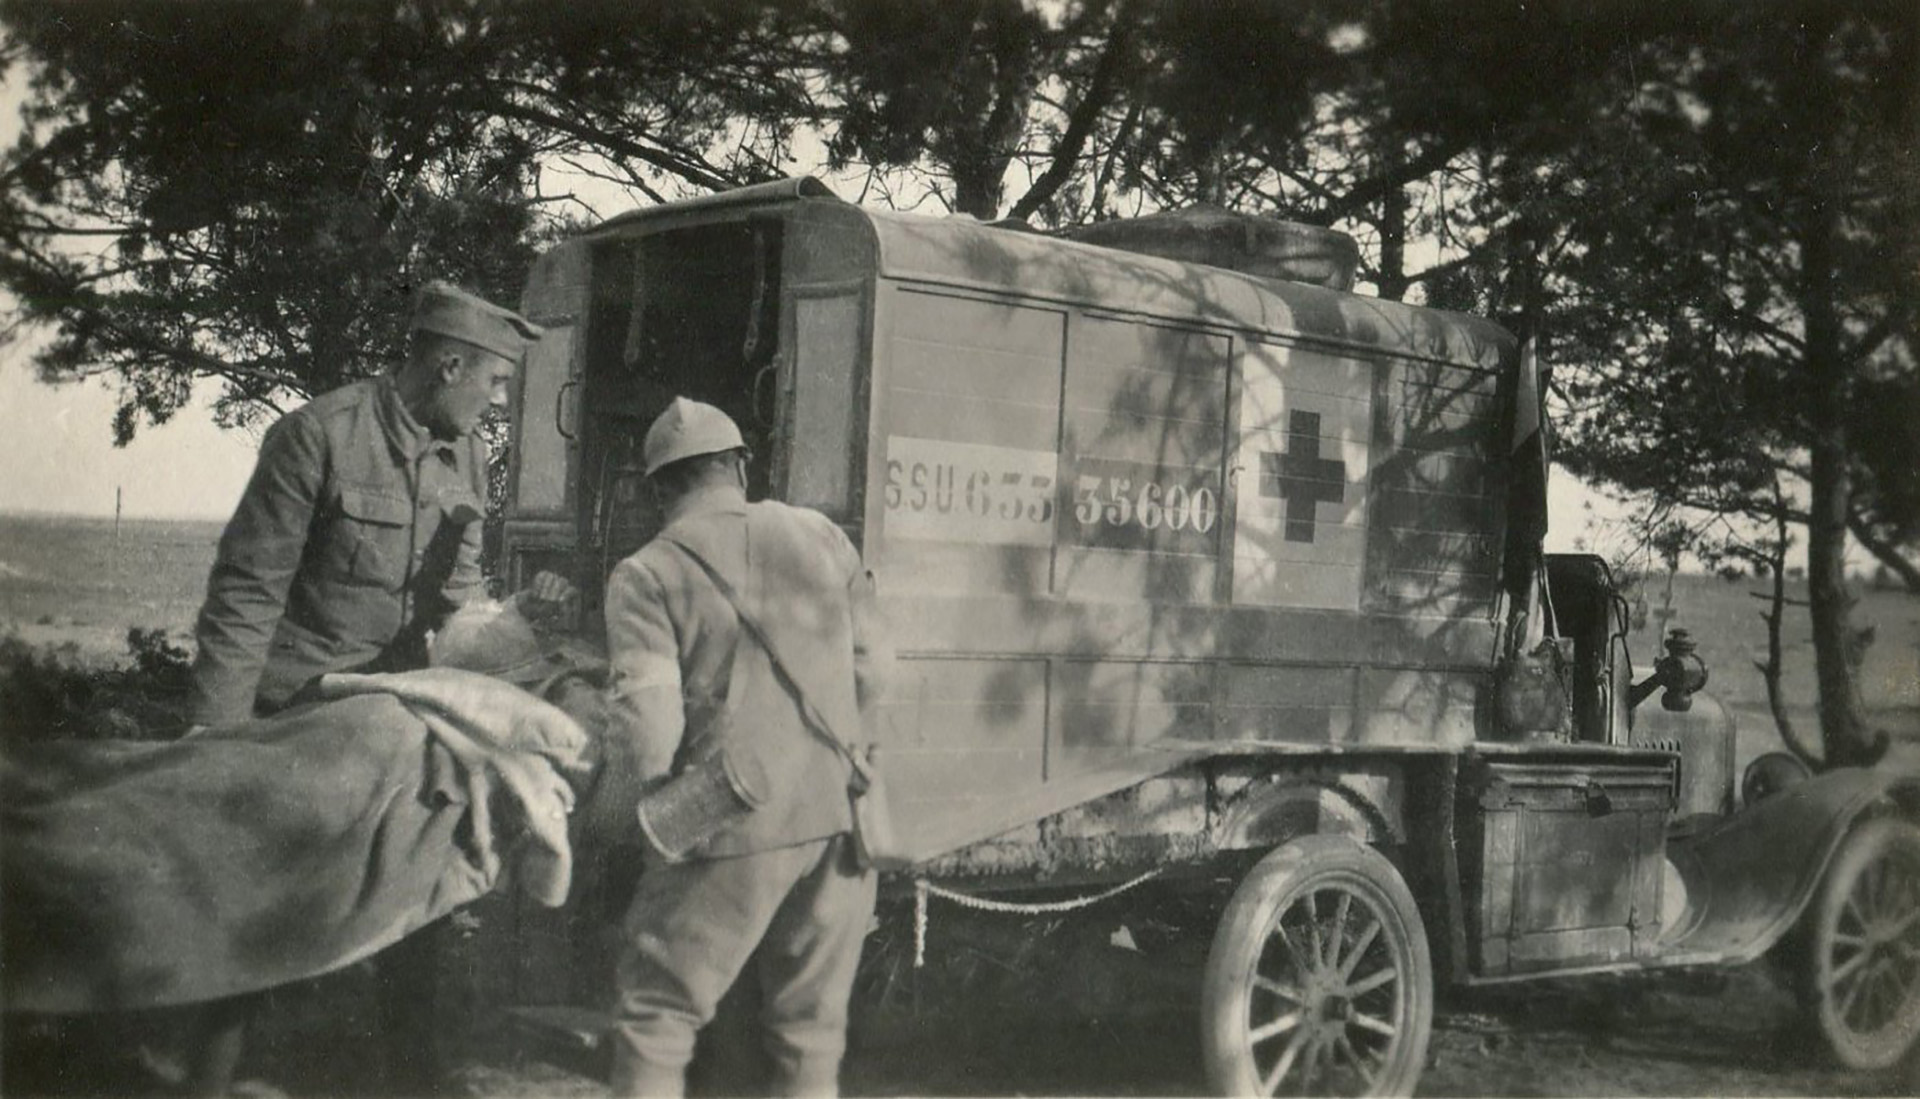 James Moses participó de la guerra como conductor de ambulancias a bordo de un Ford T (Shawn Moses y Jason Jellison)